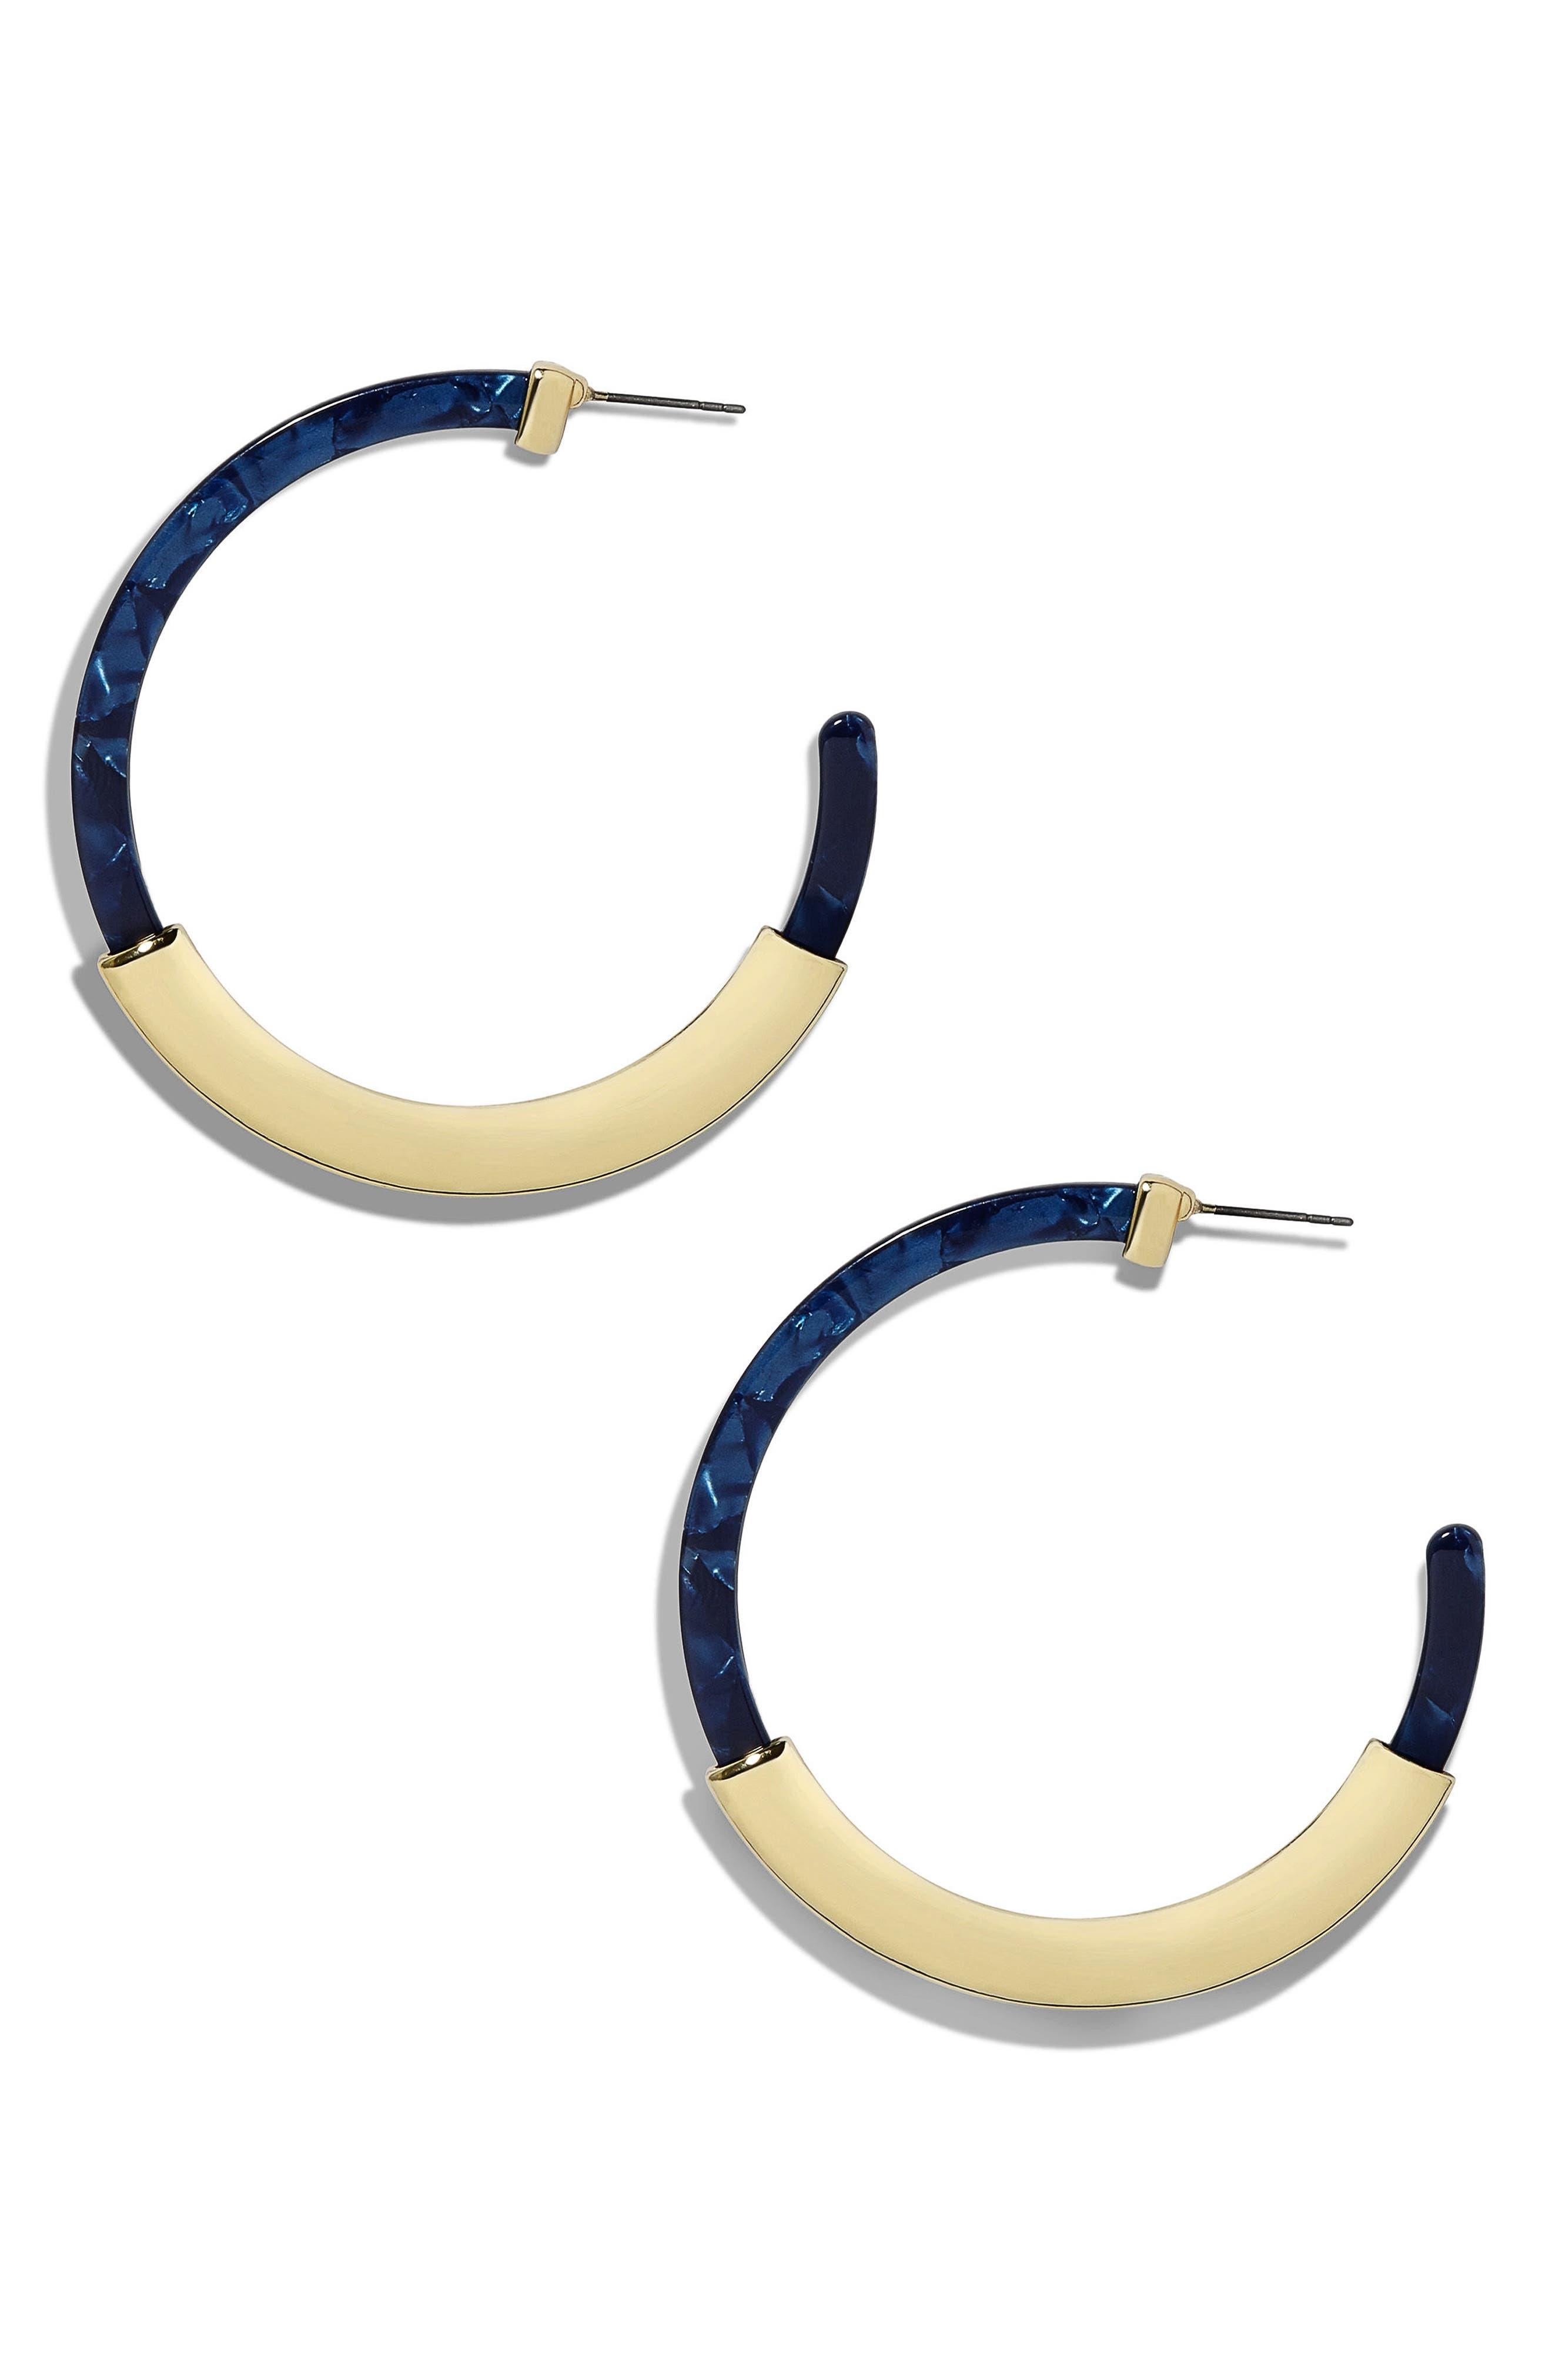 Tassiana Gold & Acrylic Hoop Earrings,                         Main,                         color, Cobalt